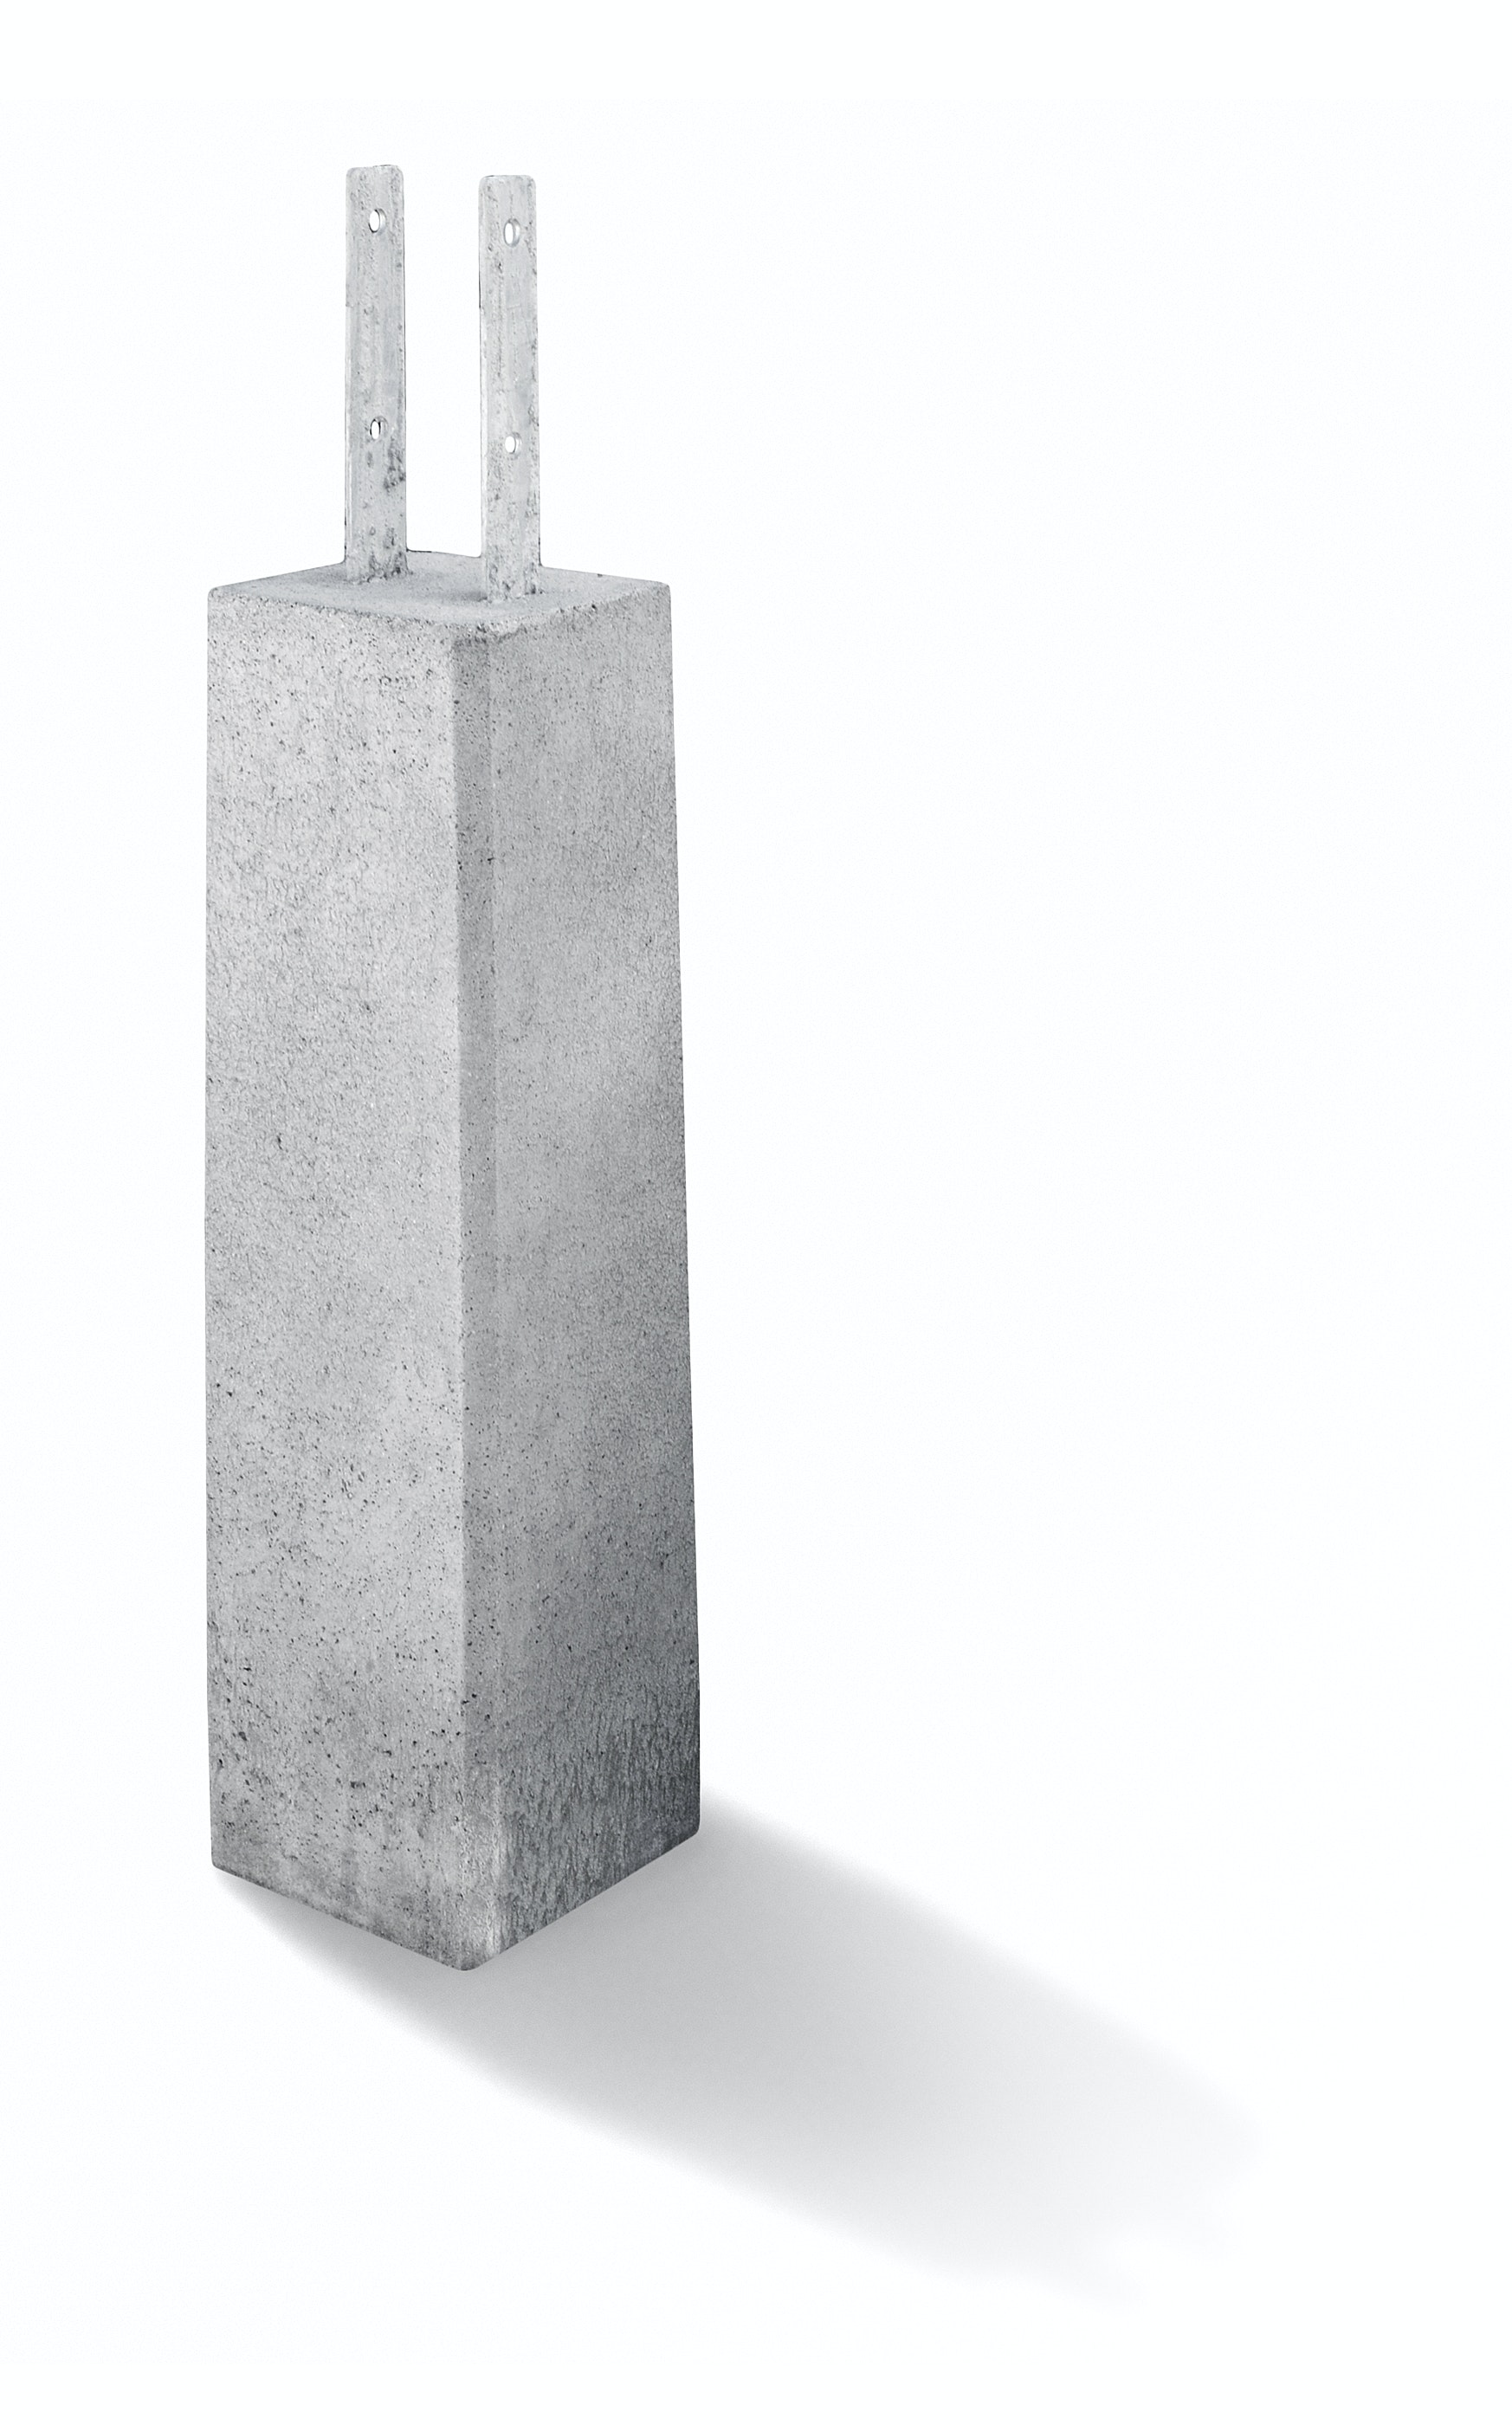 Plint S:t Eriks 75x500mm